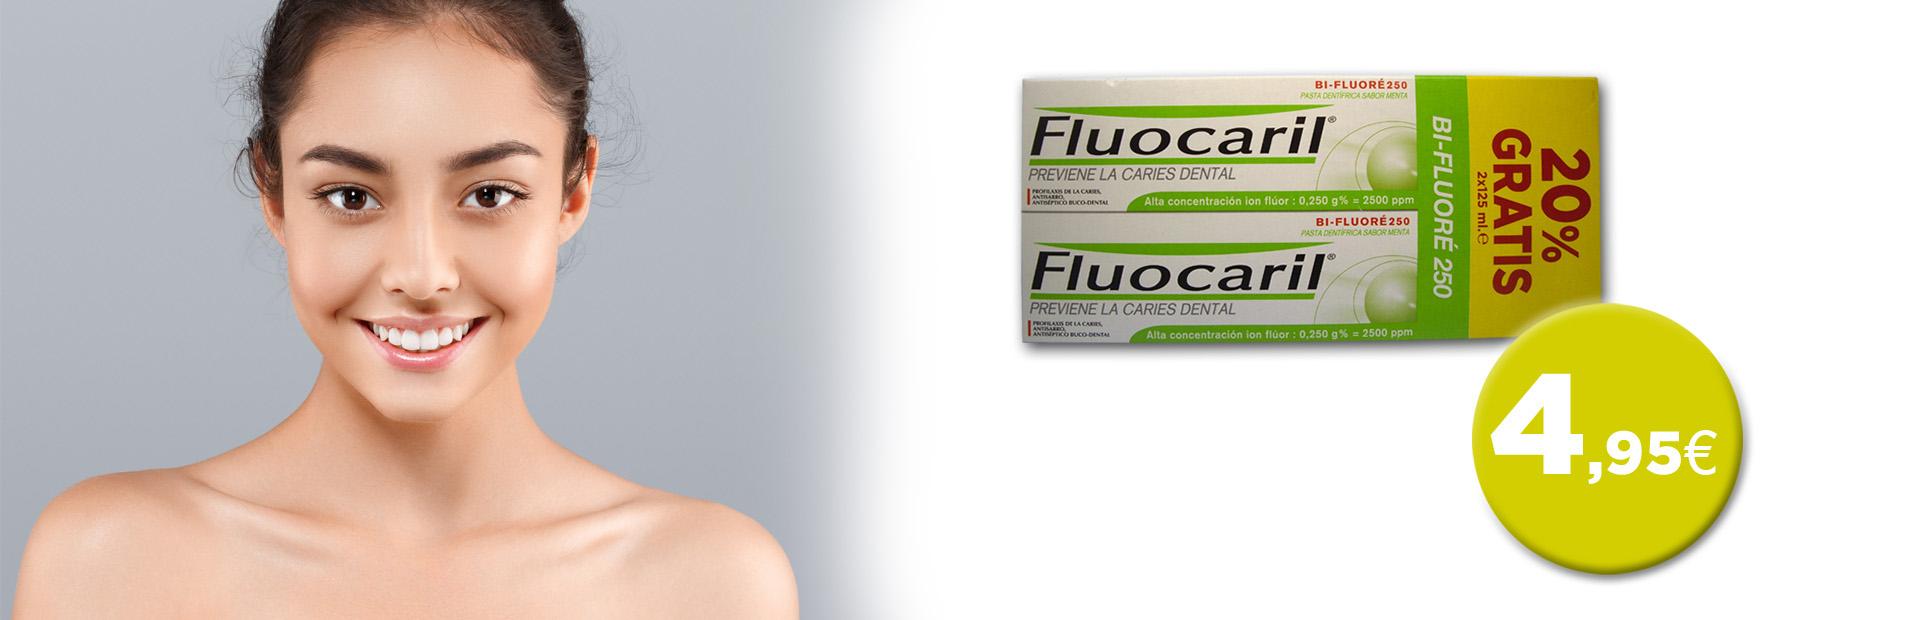 Fluocaril farmàcia parafarmàcia sant eloi andorra